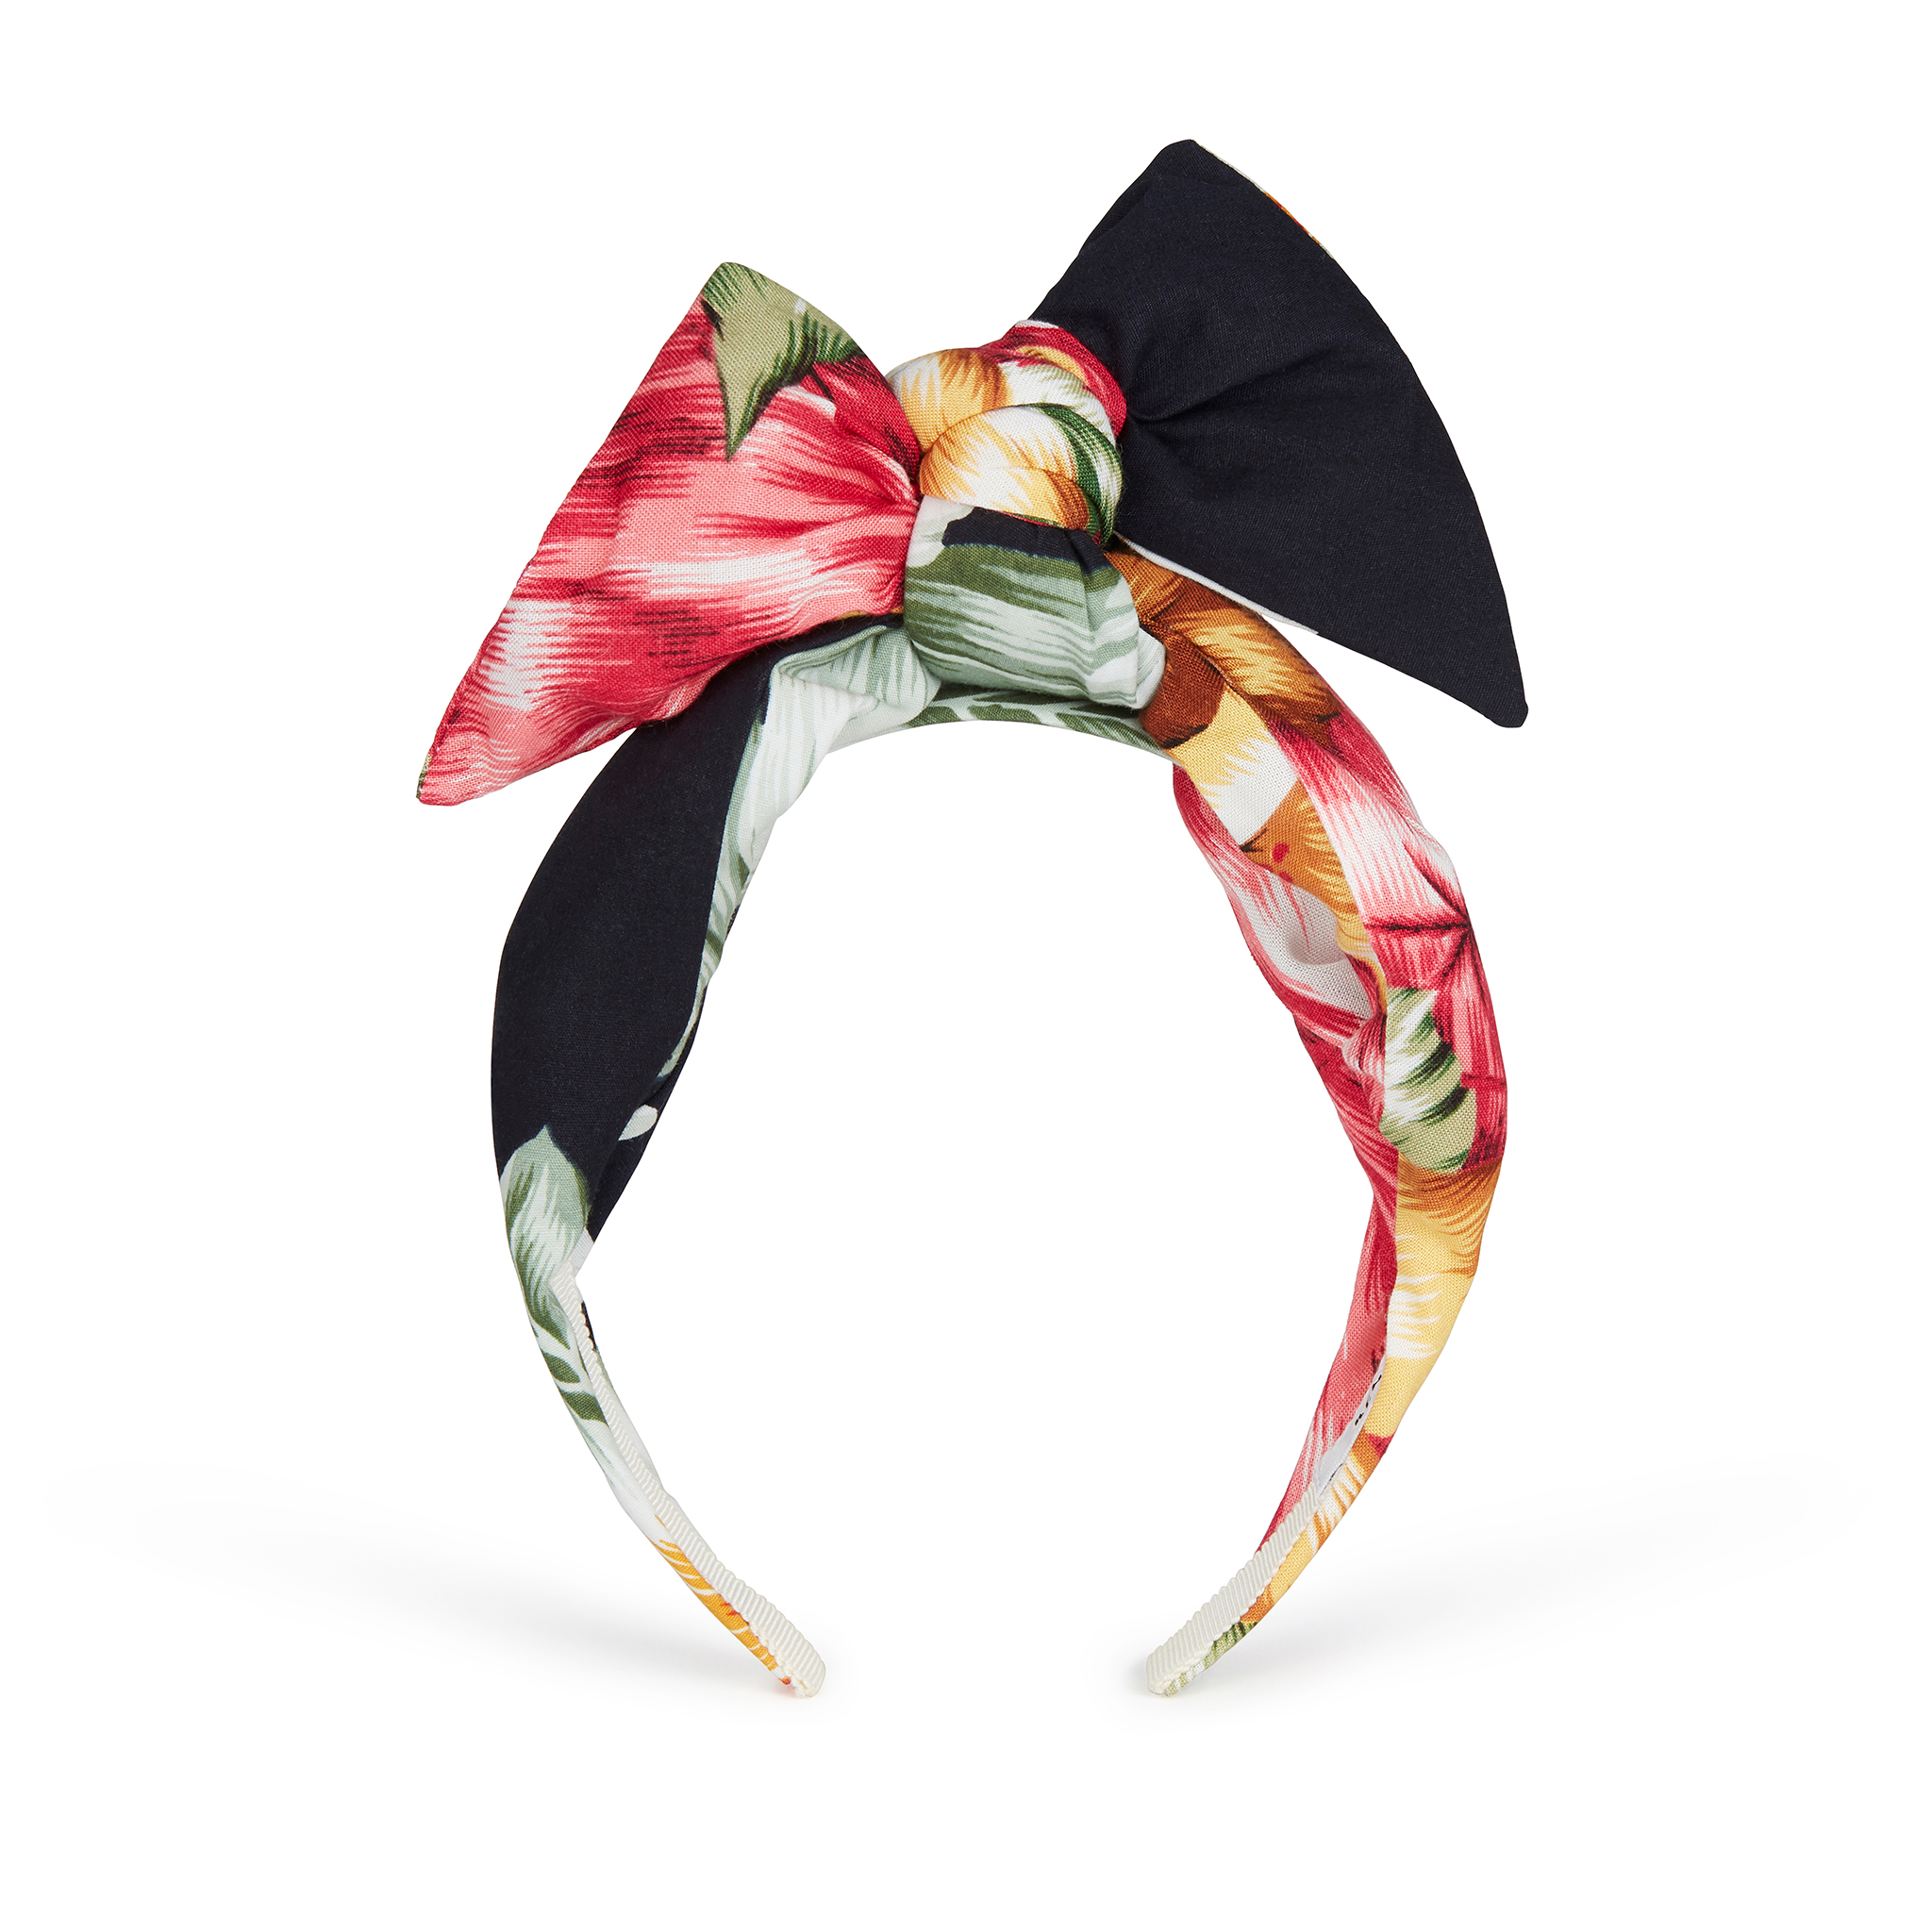 Benoit-headbands-_10.jpg